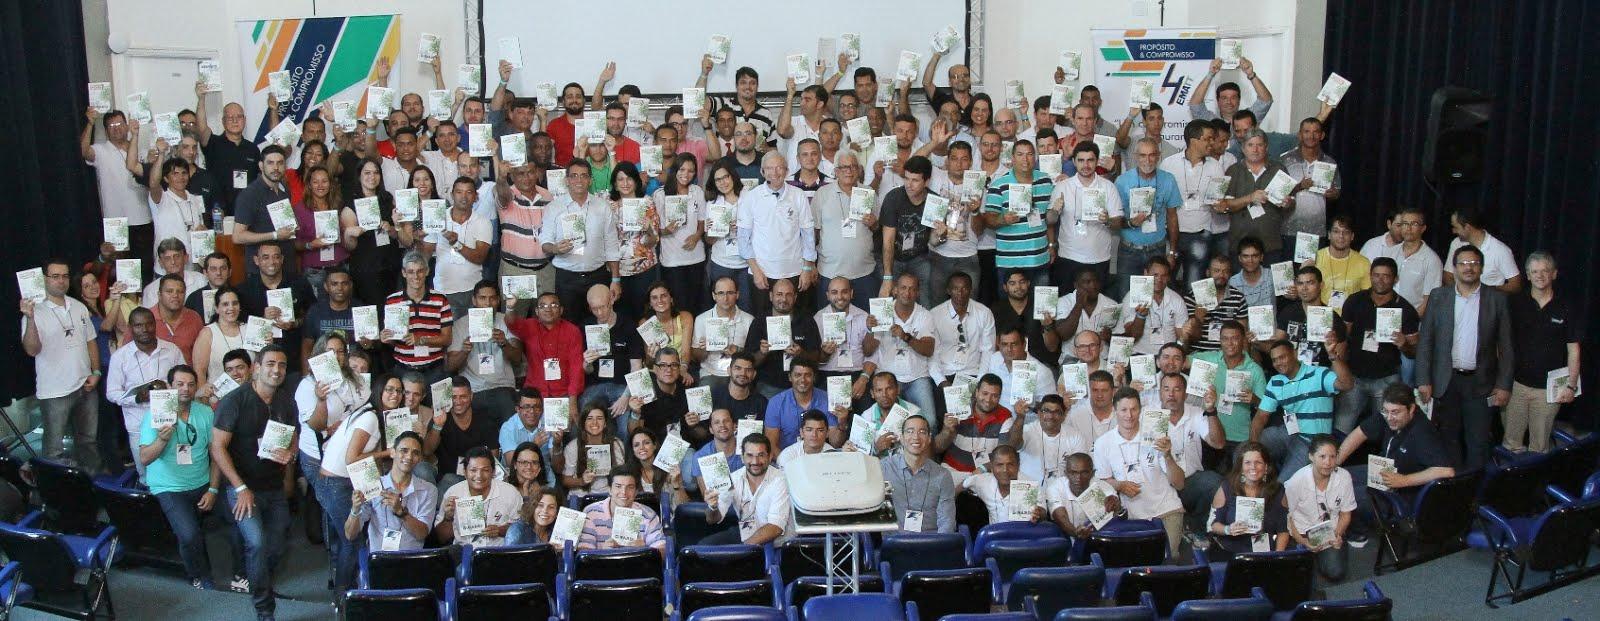 Palestra na TESA em Brasília